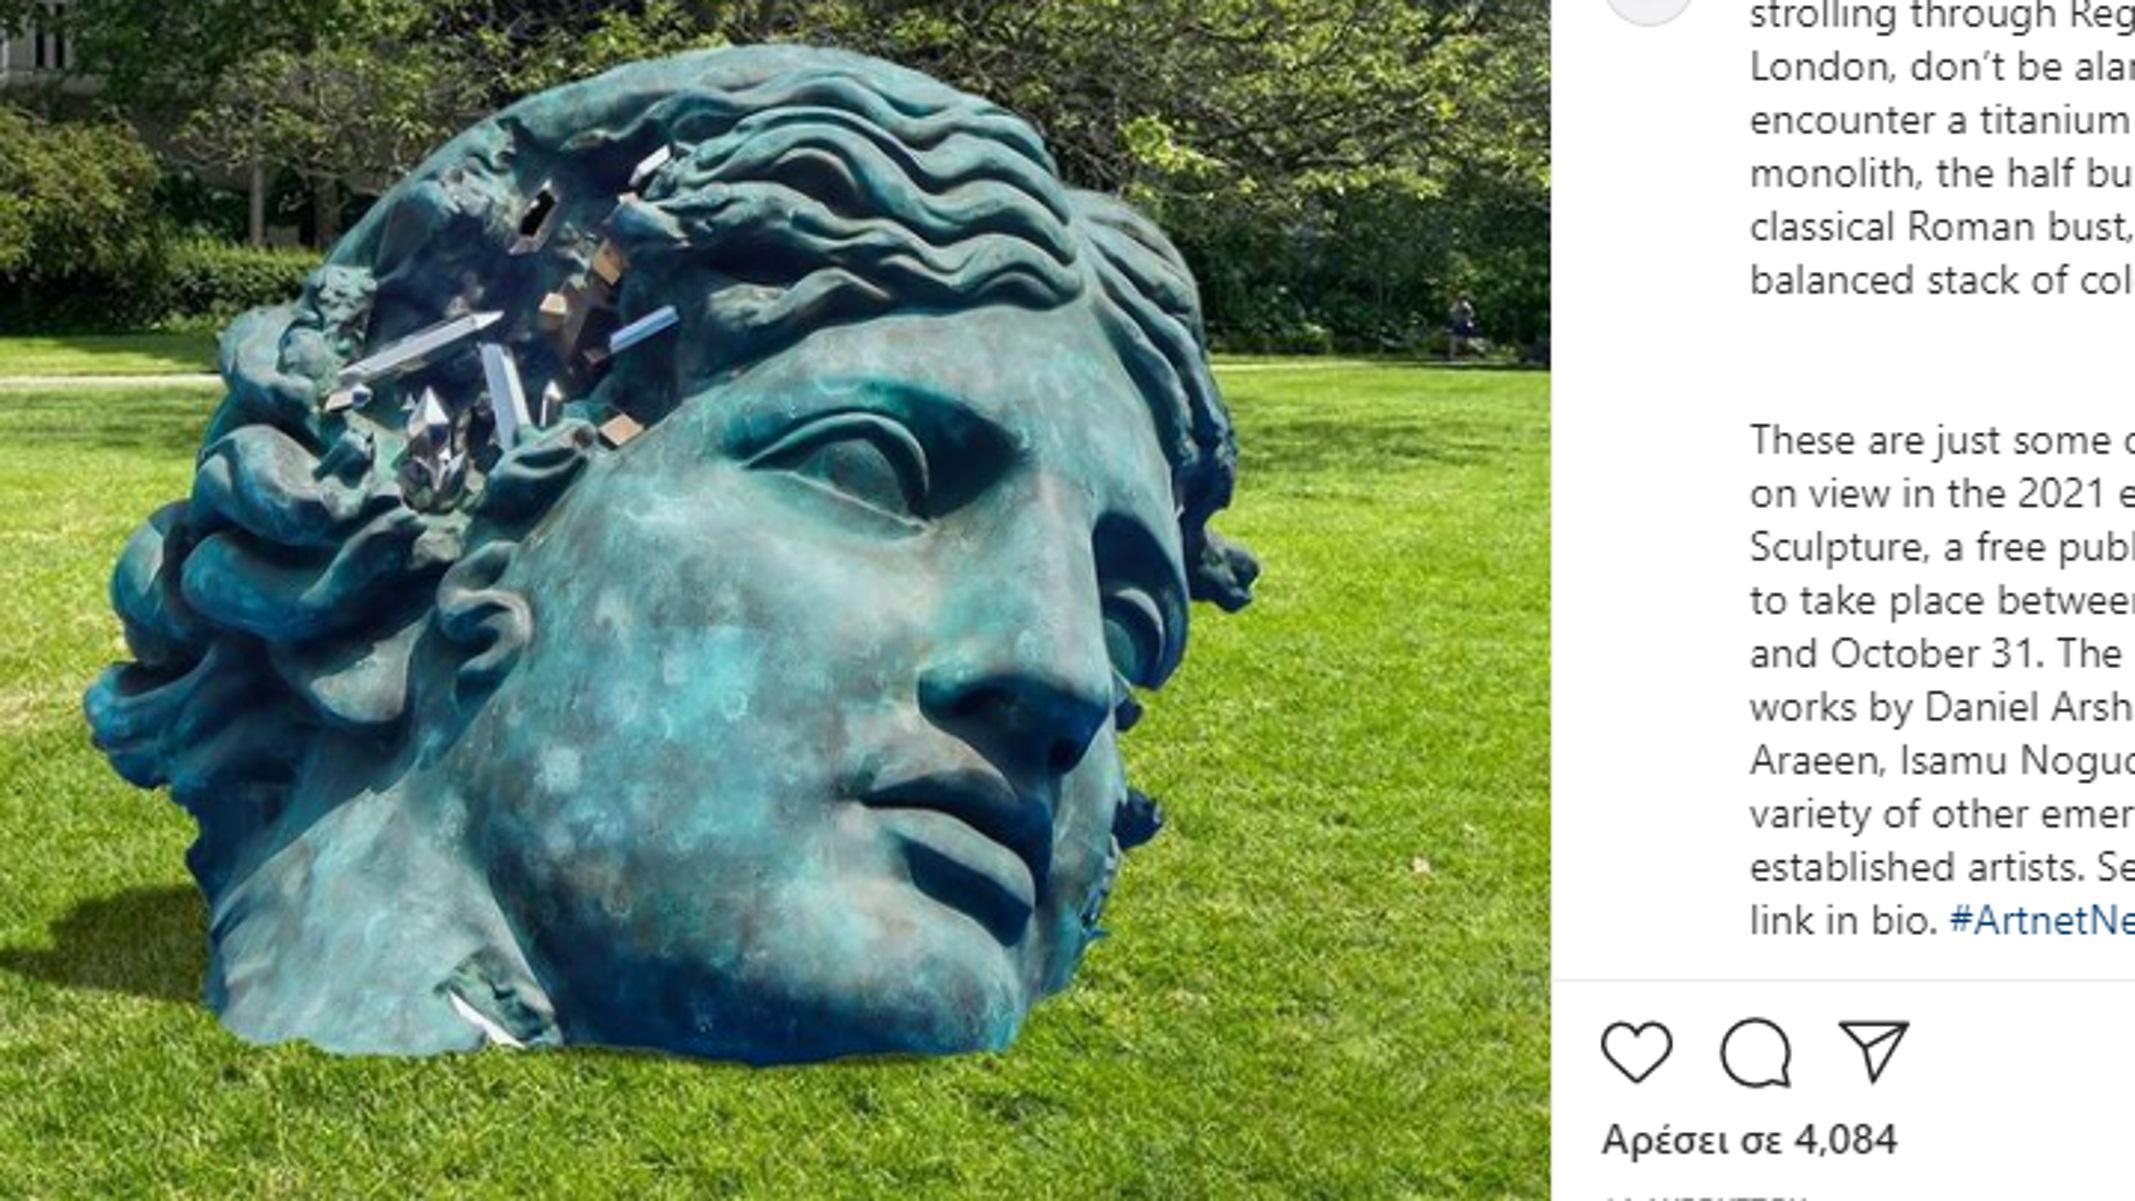 Frieze Sculpture: Τον Σεπτέμβριο ξανά στην καρδιά του Λονδίνου